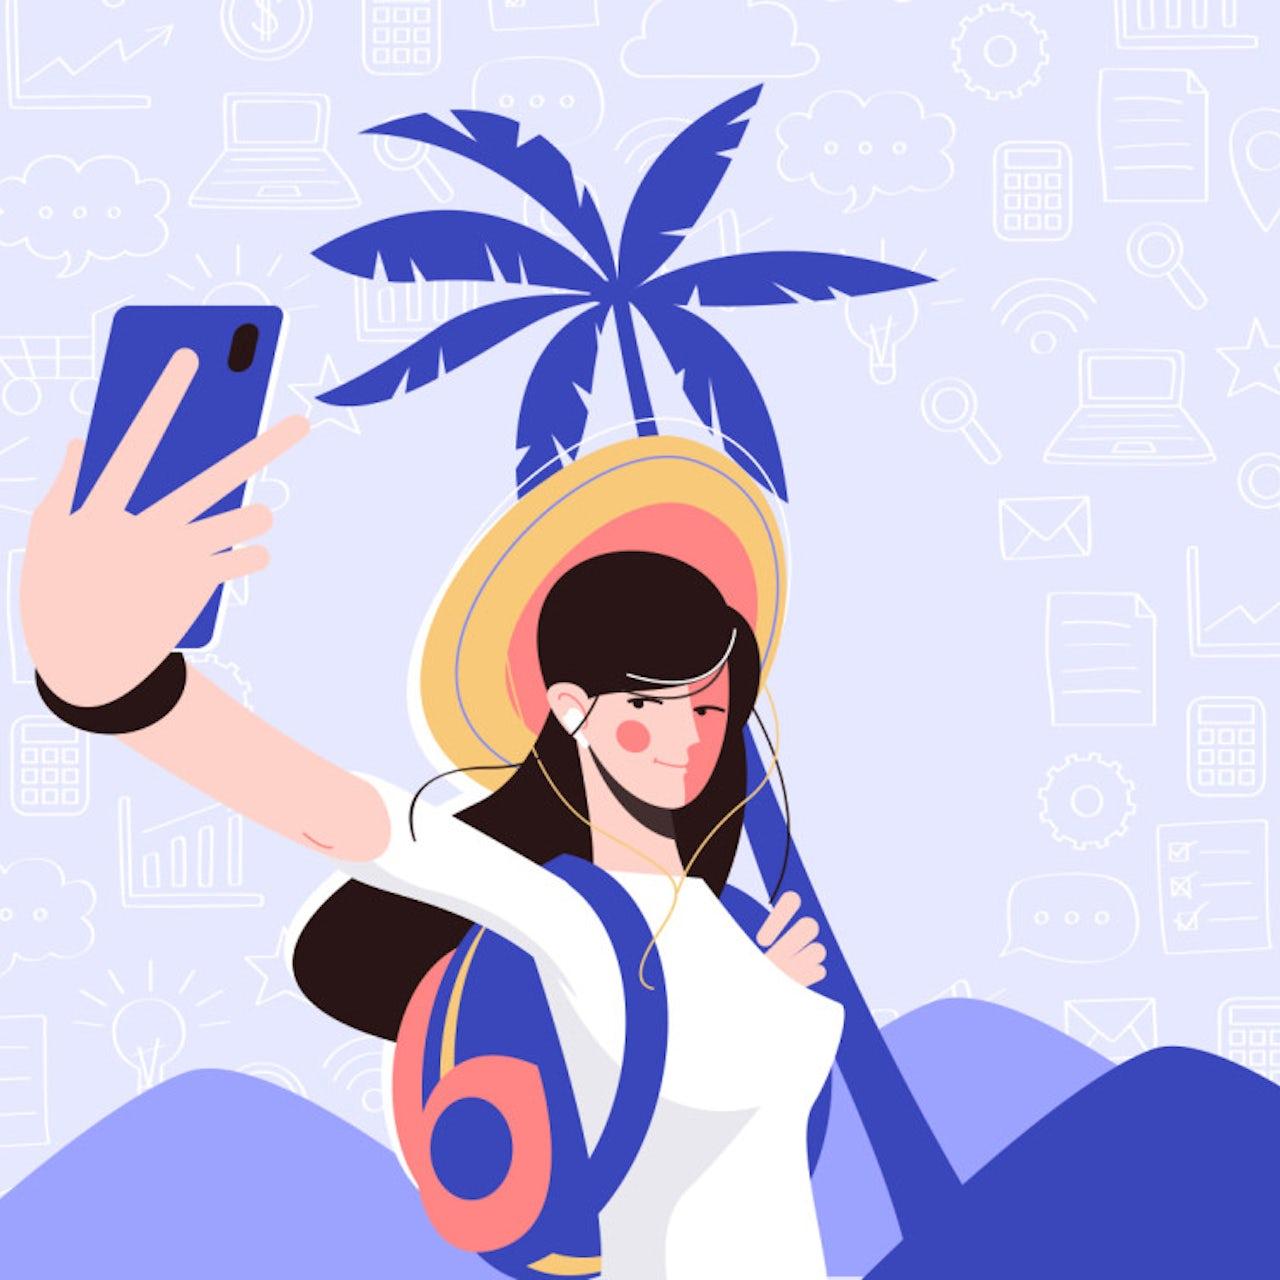 10 Top Digital Marketing Trends For 2020 99designs